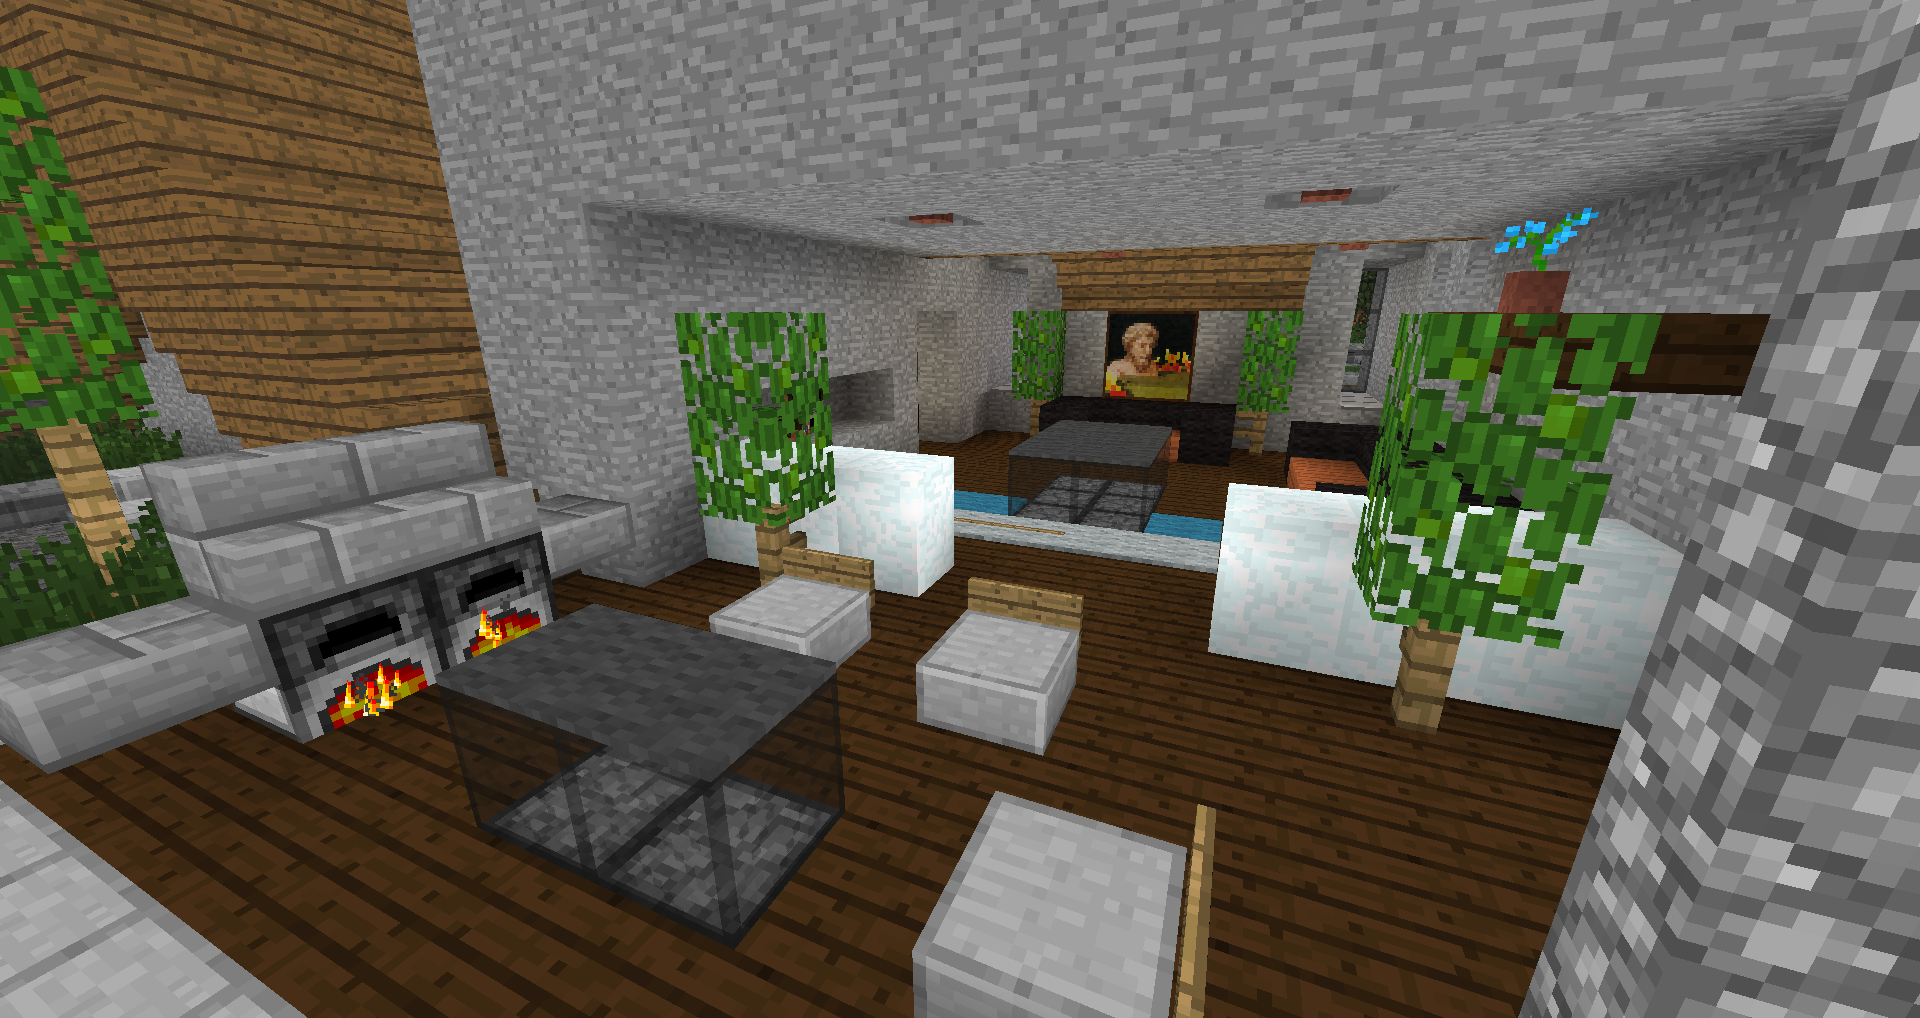 modern showcase by j h gestartete projekte. Black Bedroom Furniture Sets. Home Design Ideas